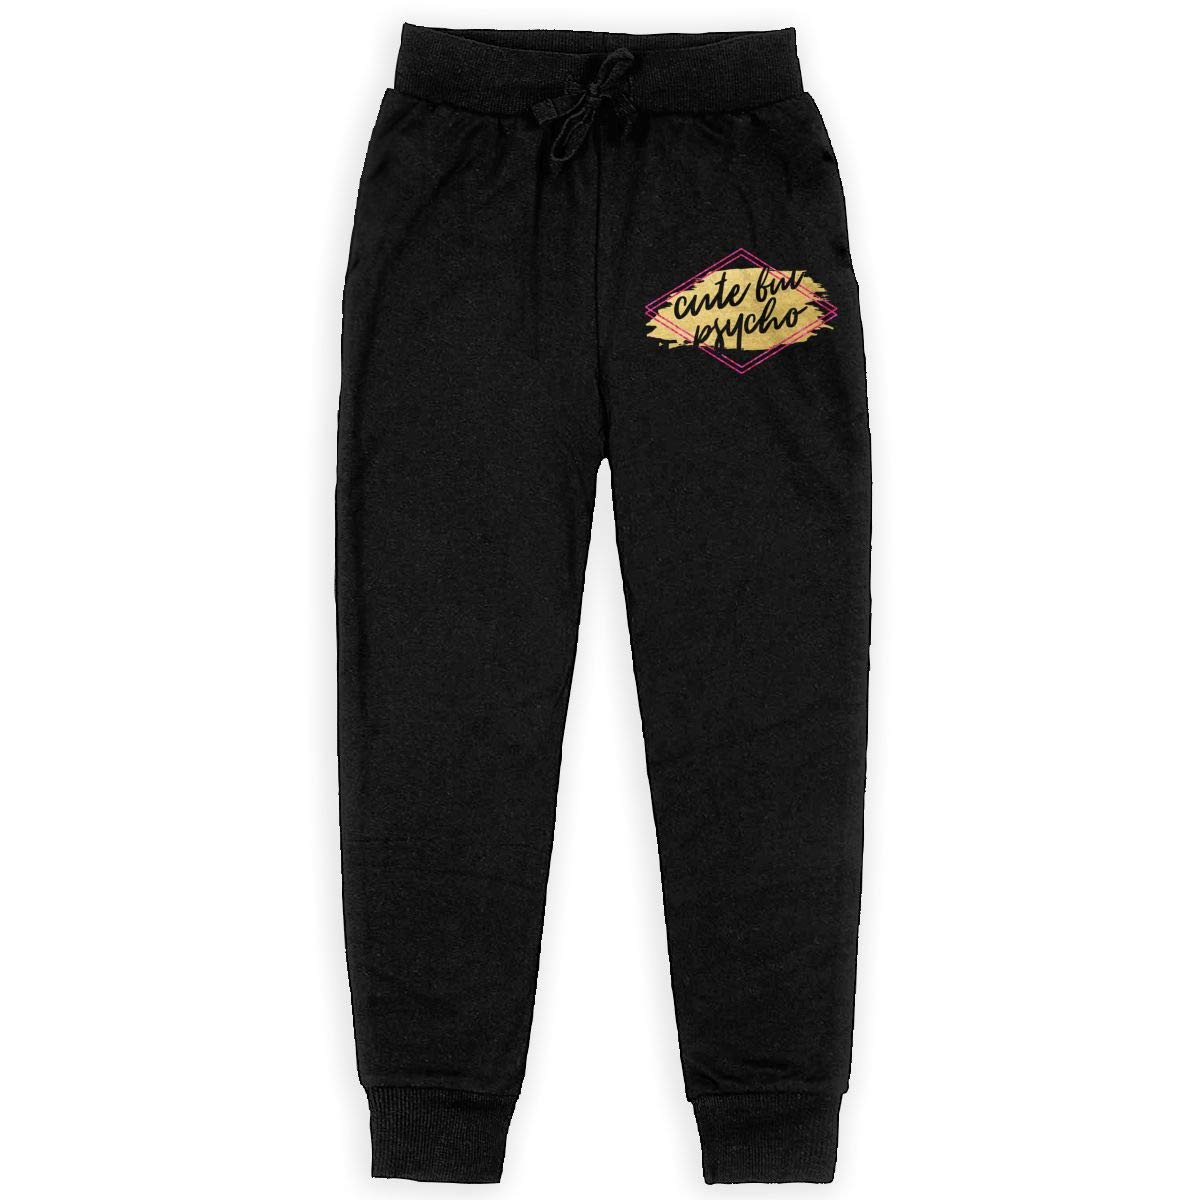 Bing4Bing Cute But Psycho Teenagers Cotton Sweatpants Joggers Pants Active Pants